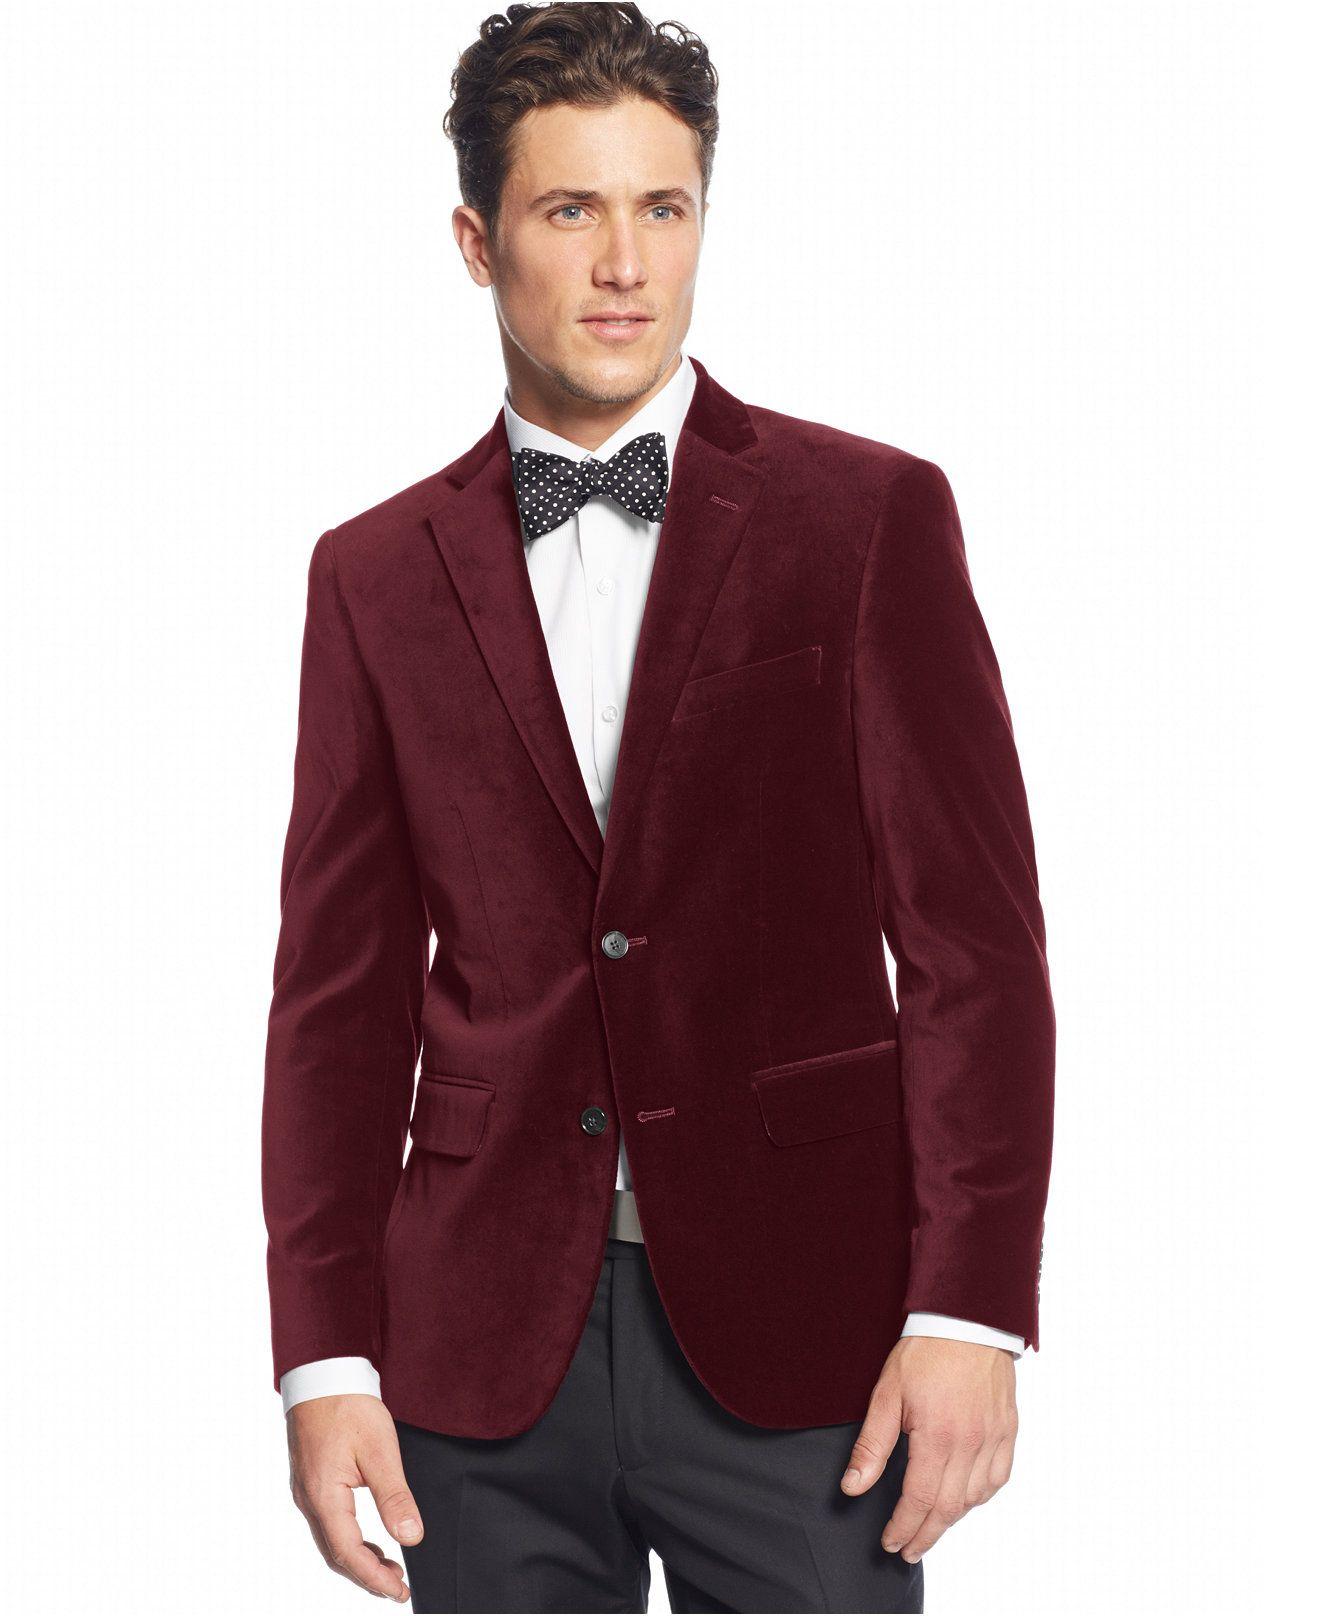 Alfani RED Velvet Slim-Fit Sport Coat - Blazers & Sport Coats ...